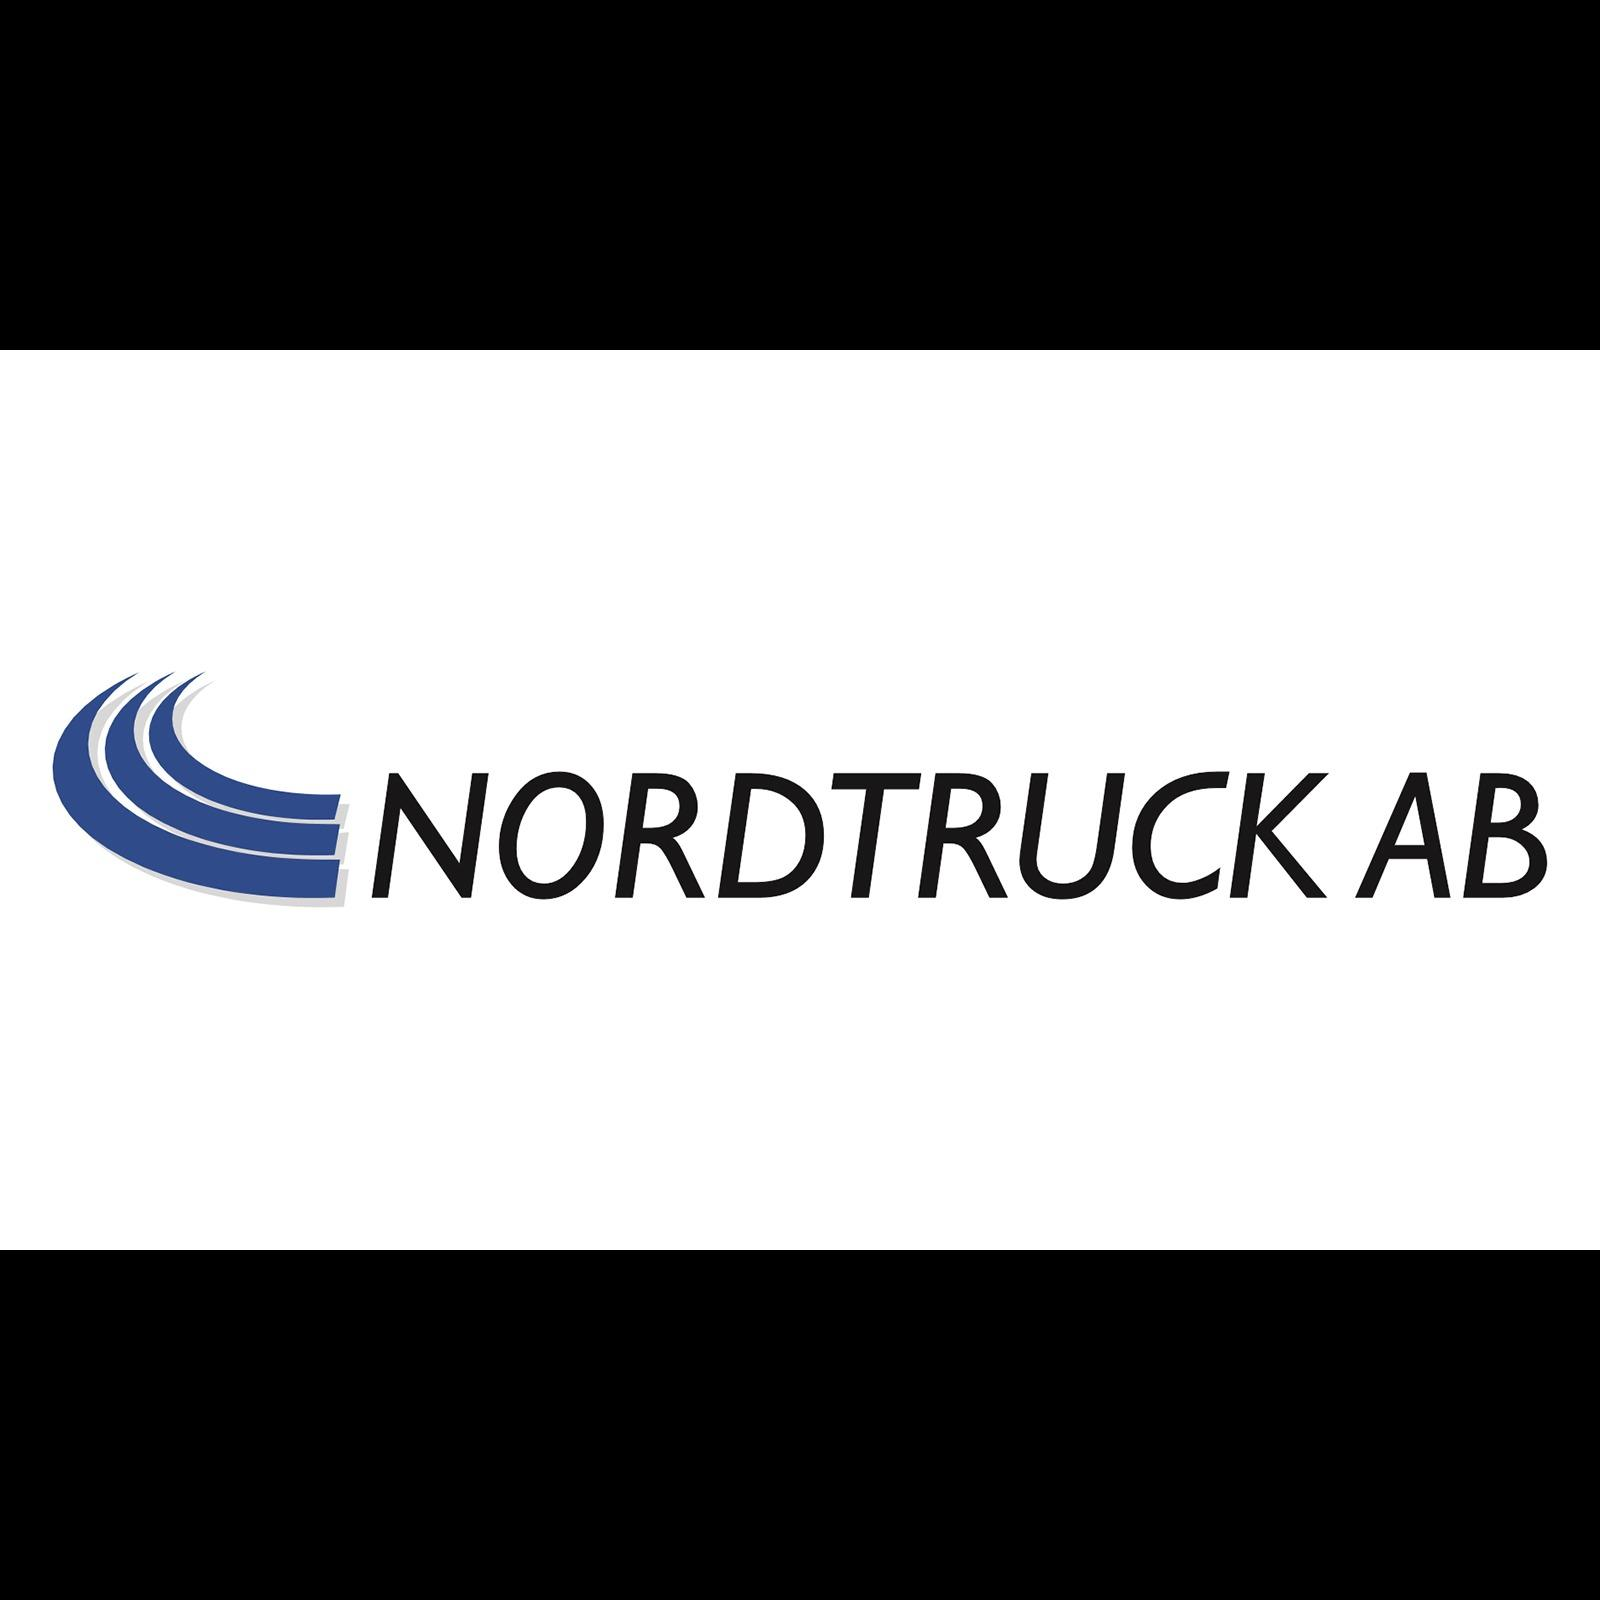 Nordtruck AB